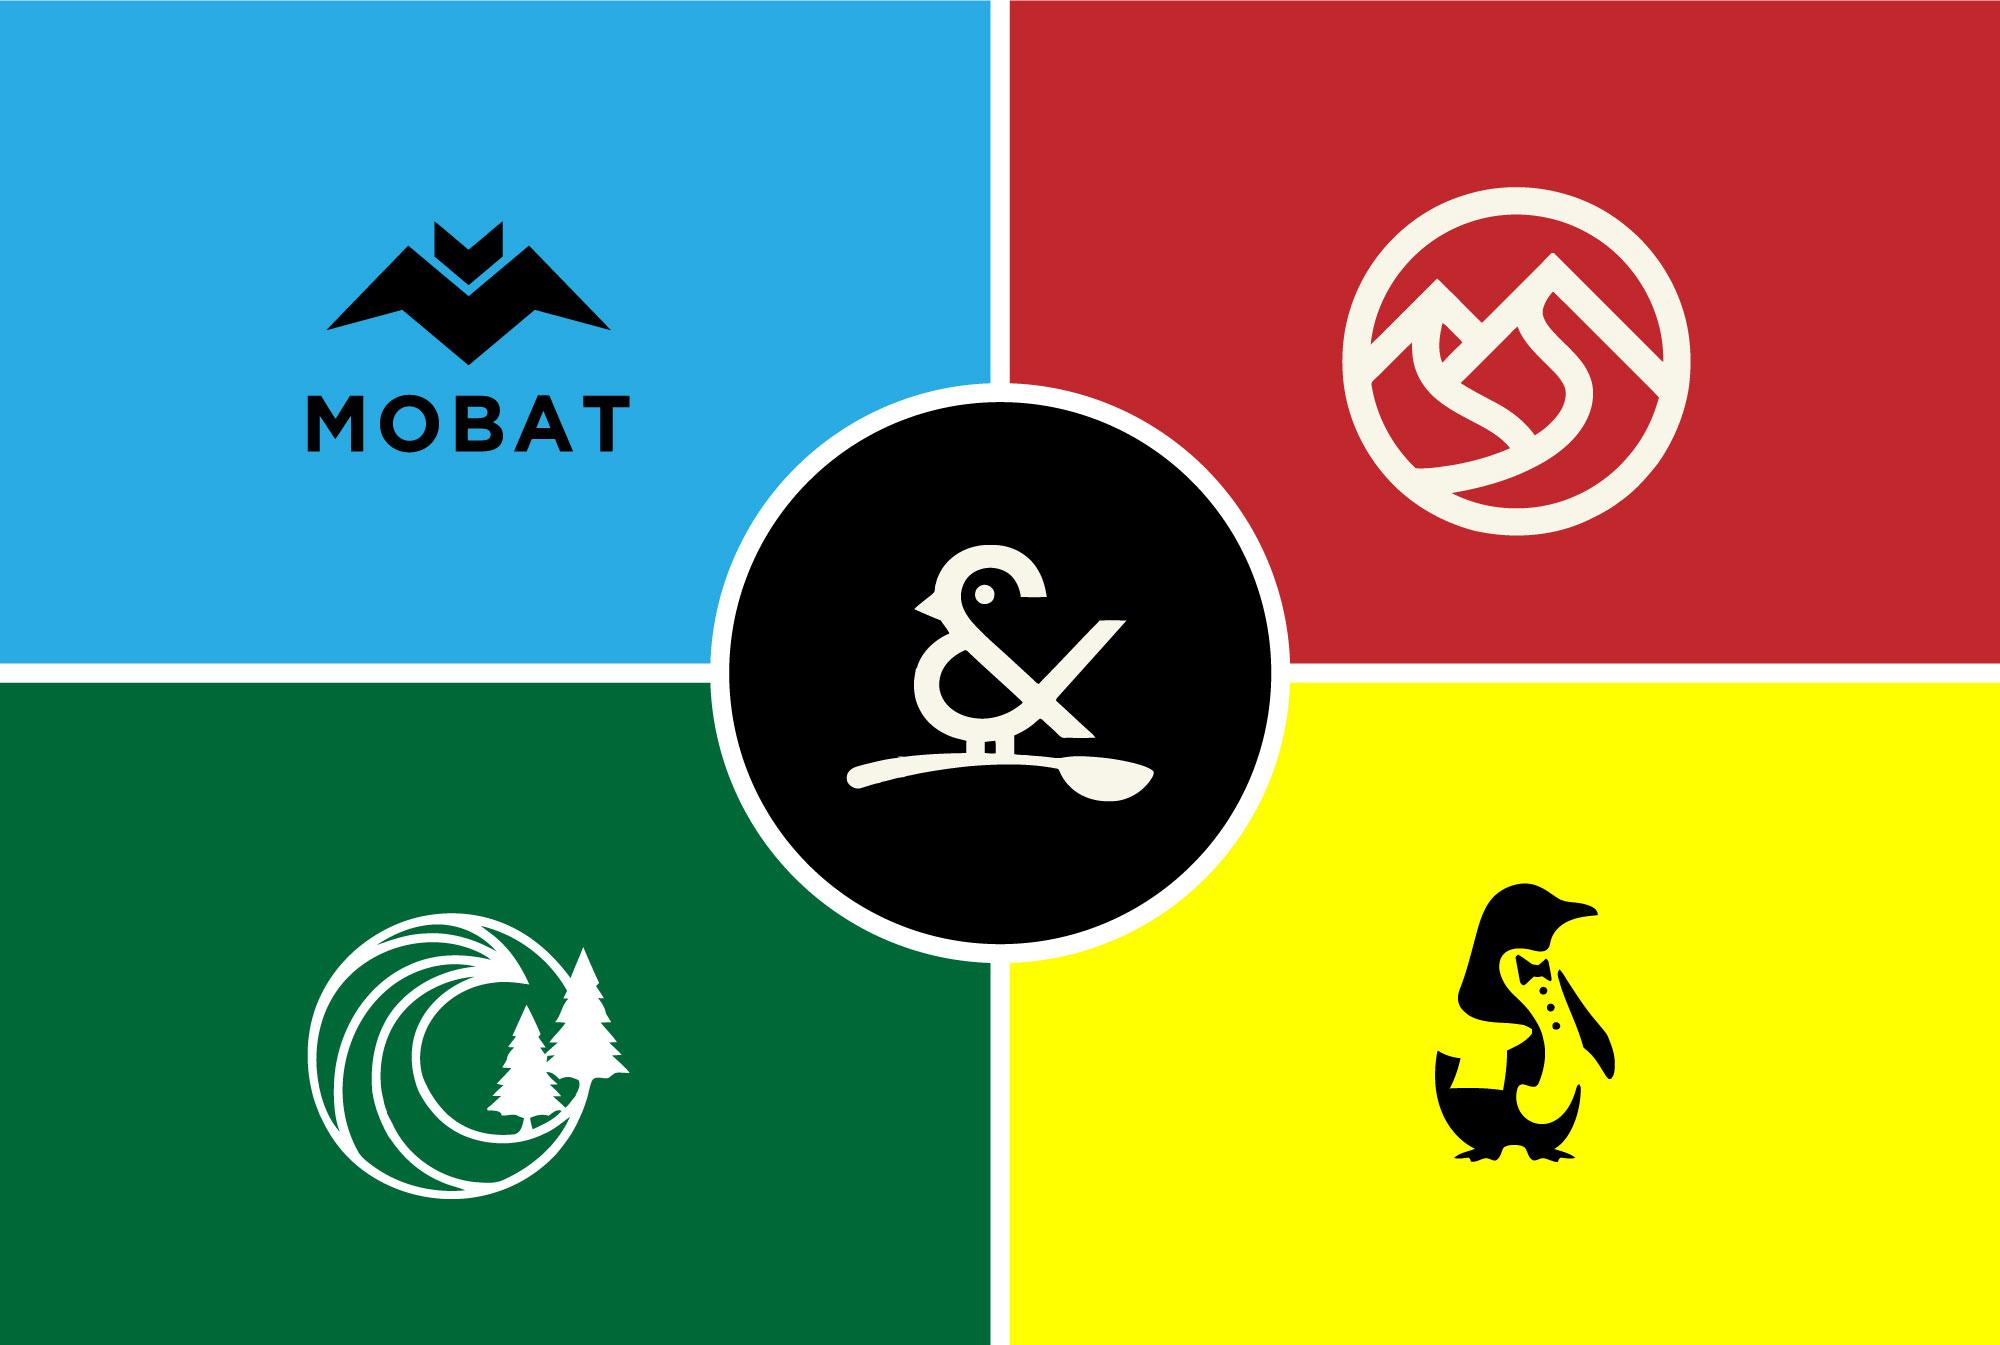 I will create Modern minimalist logo design with 24 hours